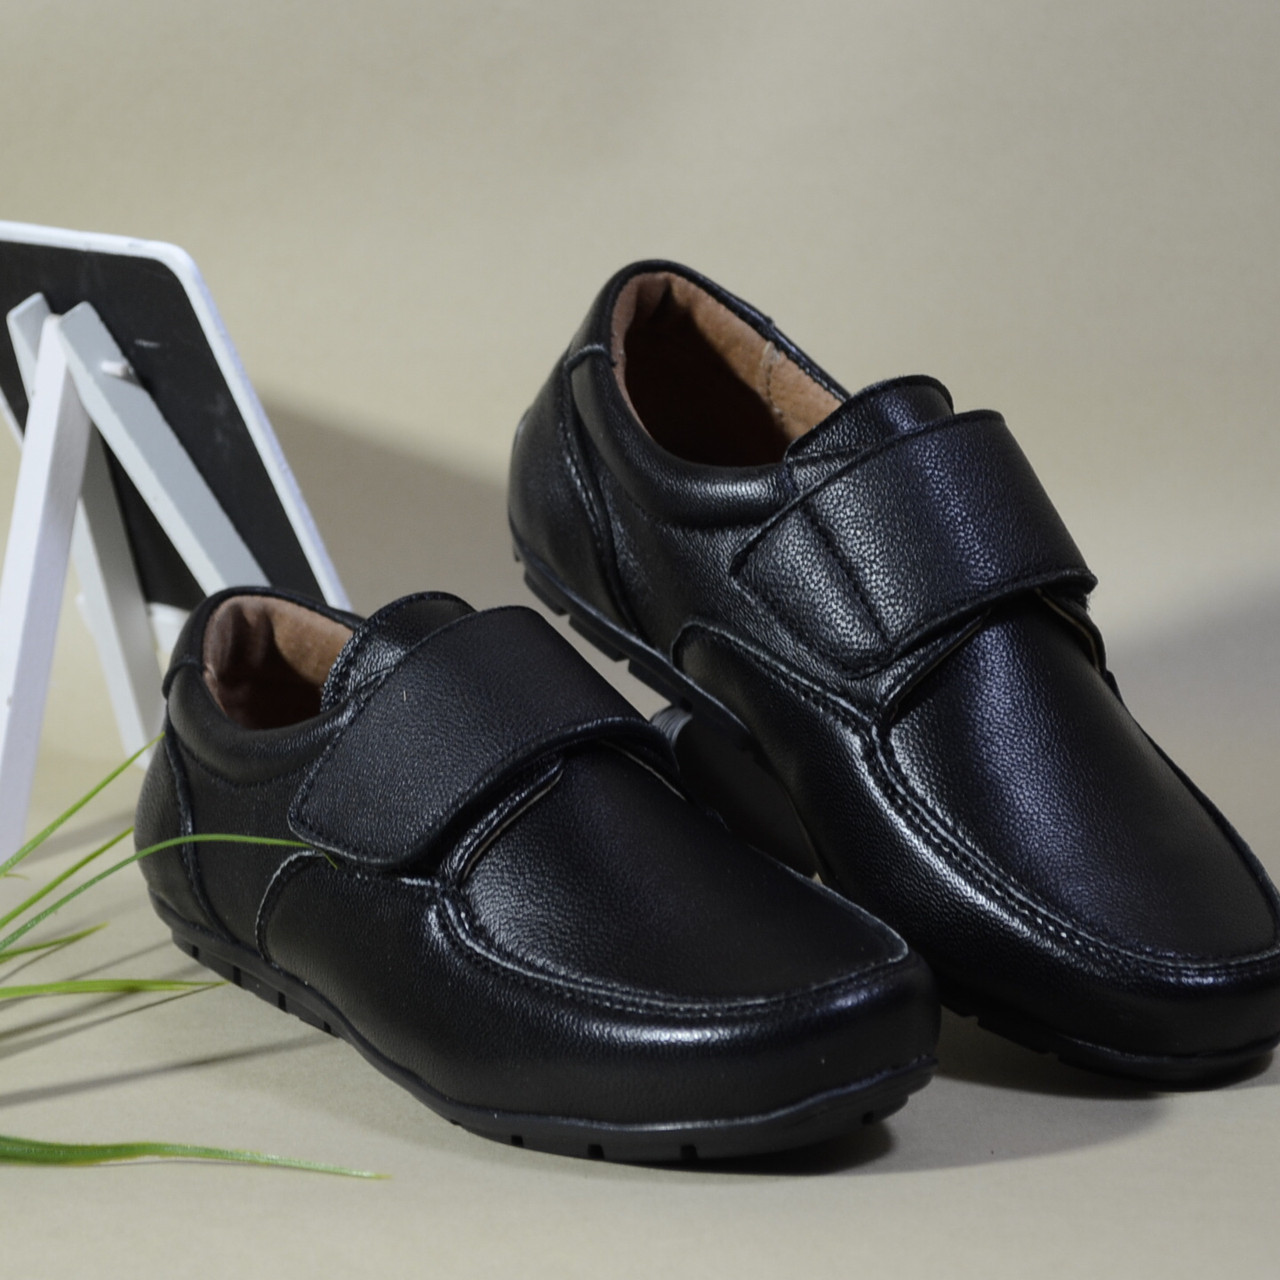 Туфли Eleven shoes 09-16-00314 (32р - 20см)